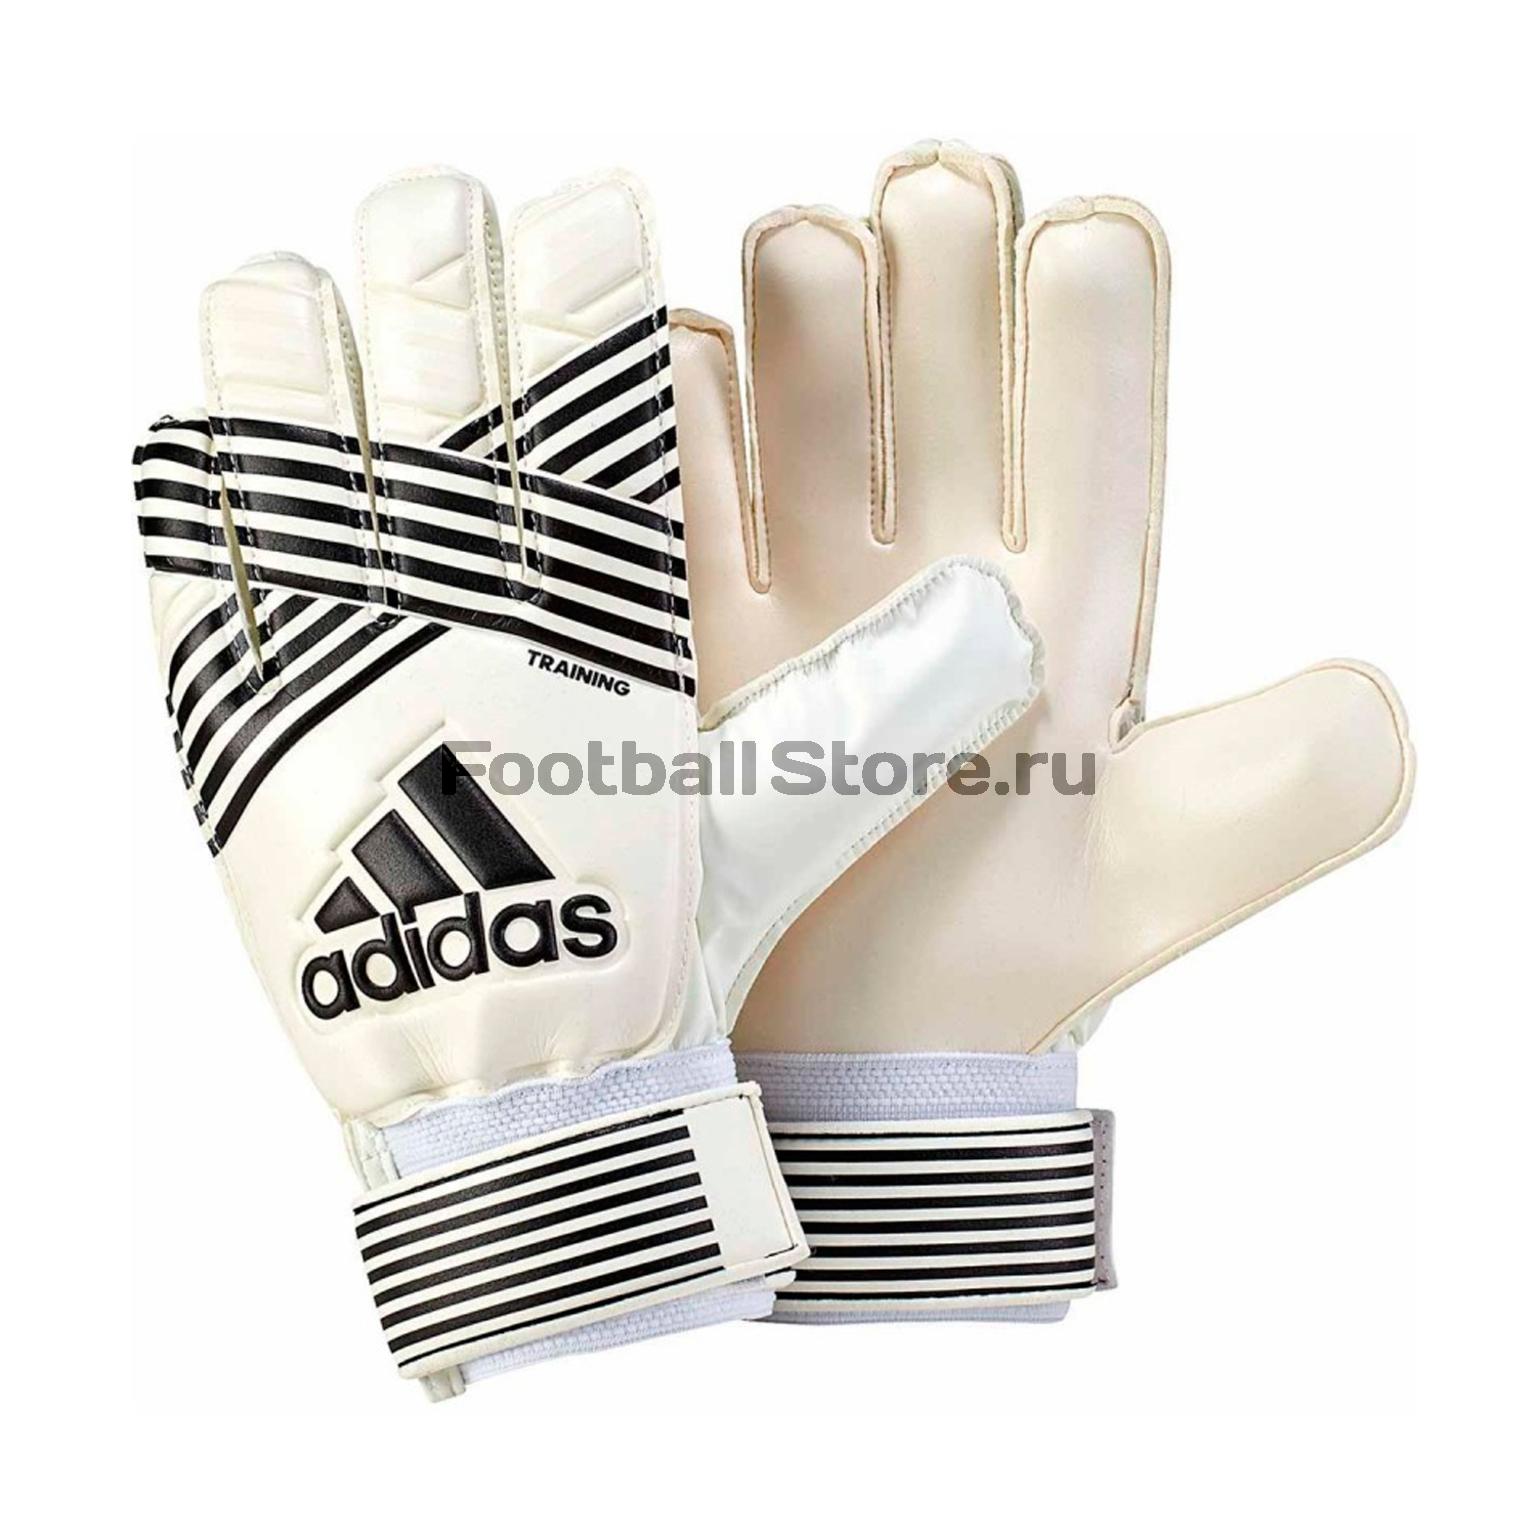 Перчатки вратарские Adidas Ace Training BQ4582 阿迪达斯(adidas)休闲运动 潮流款小肩包 s96349 黑色